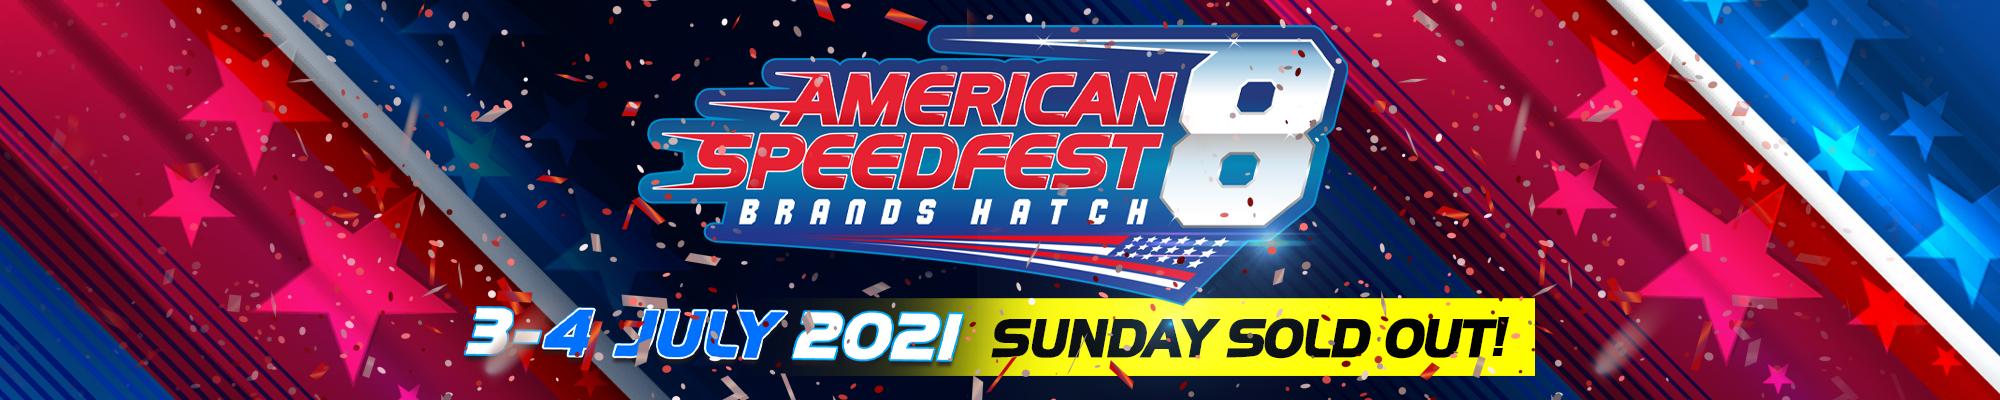 American SpeedFest 8